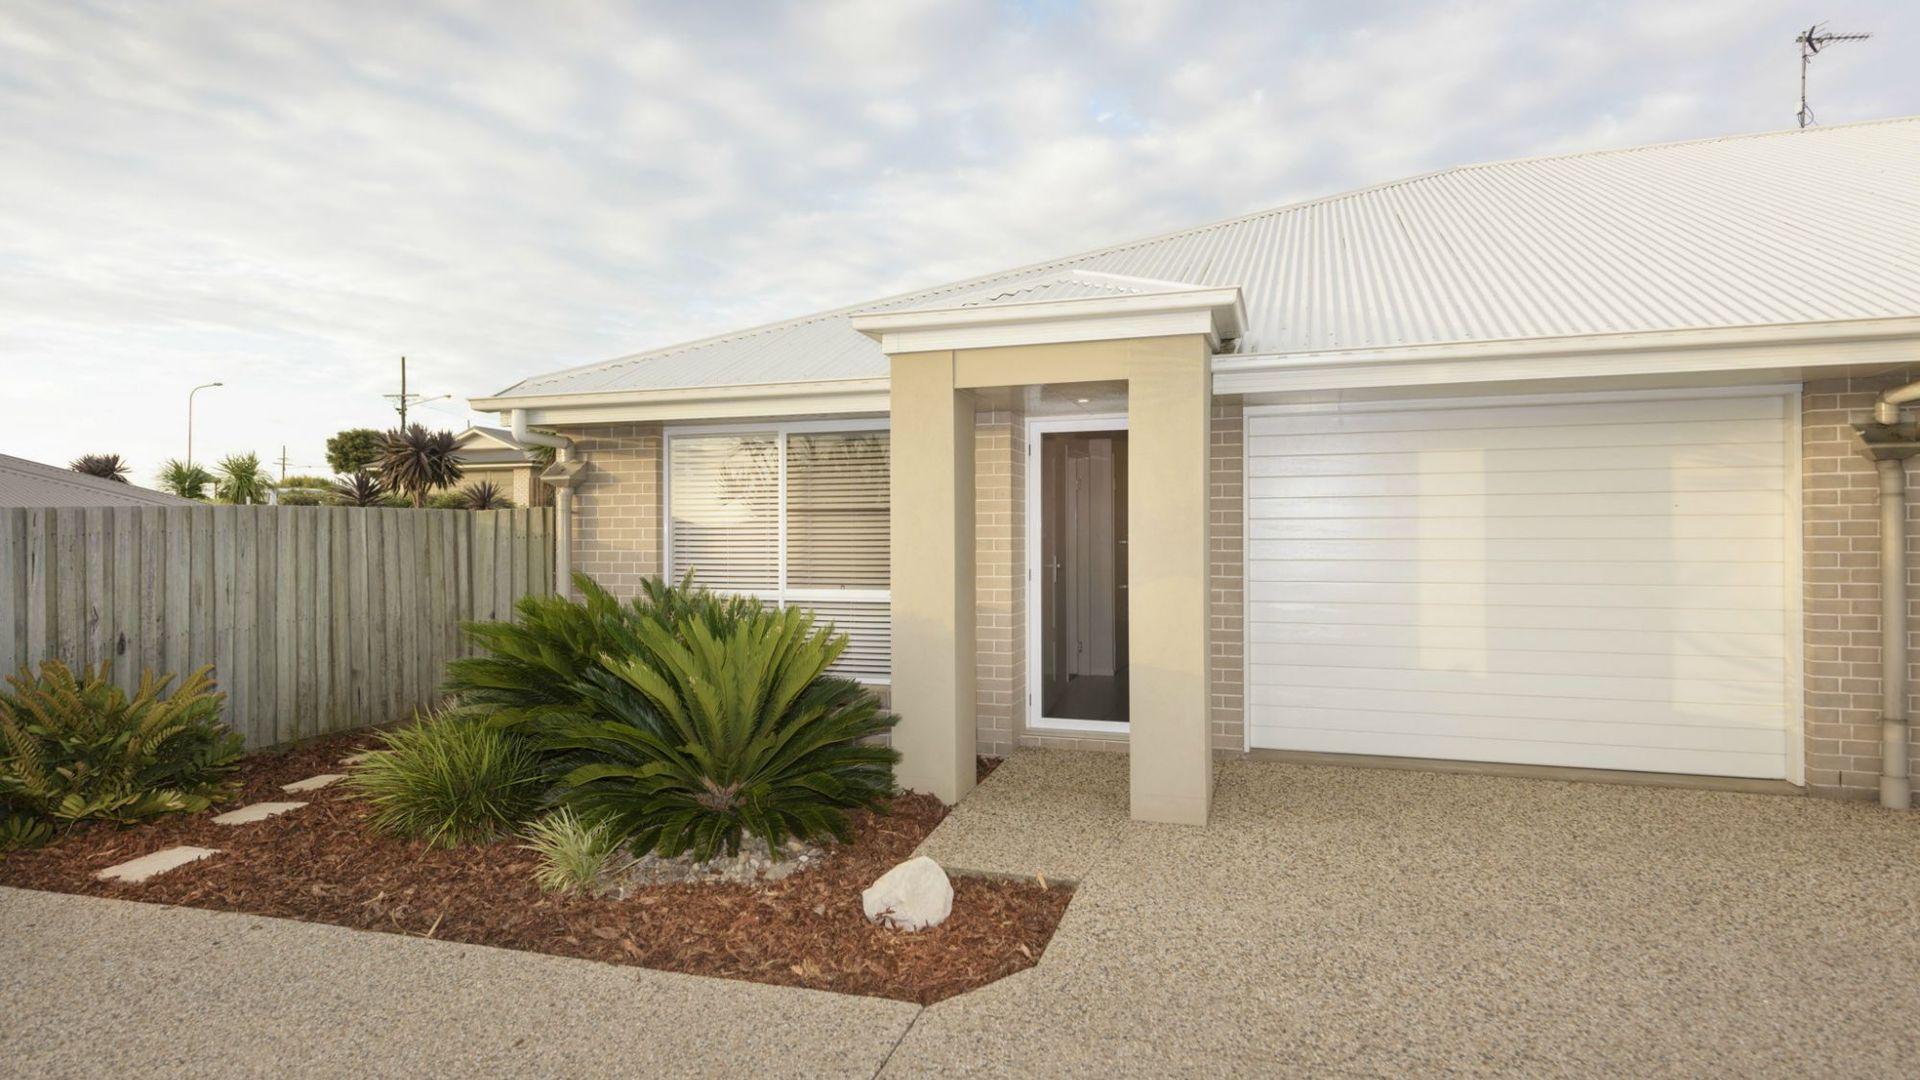 3/33 Croydon Street, Harristown QLD 4350, Image 1